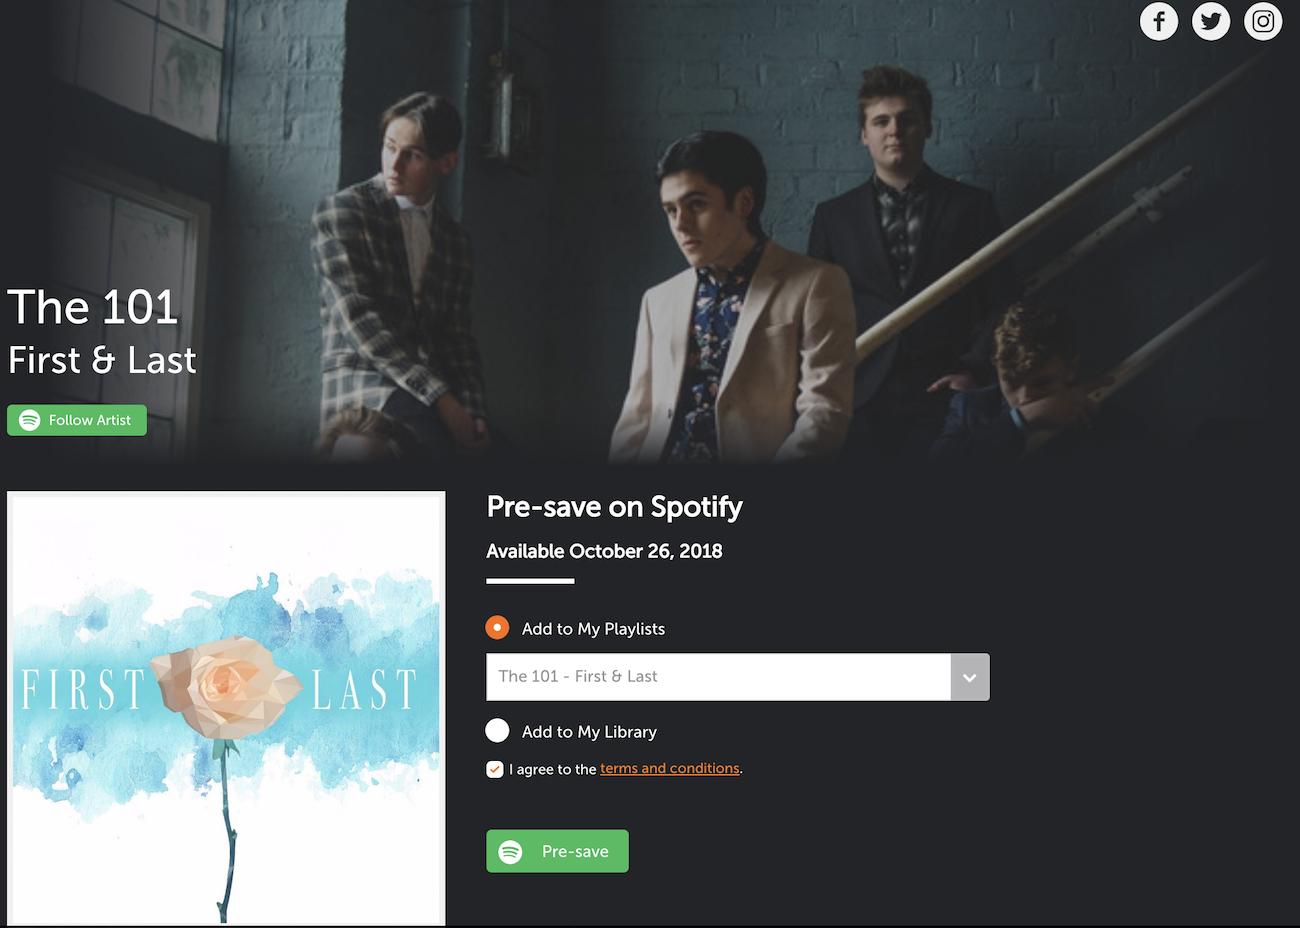 How Do I Set Up a Pre-Save on Spotify? - EmuBands